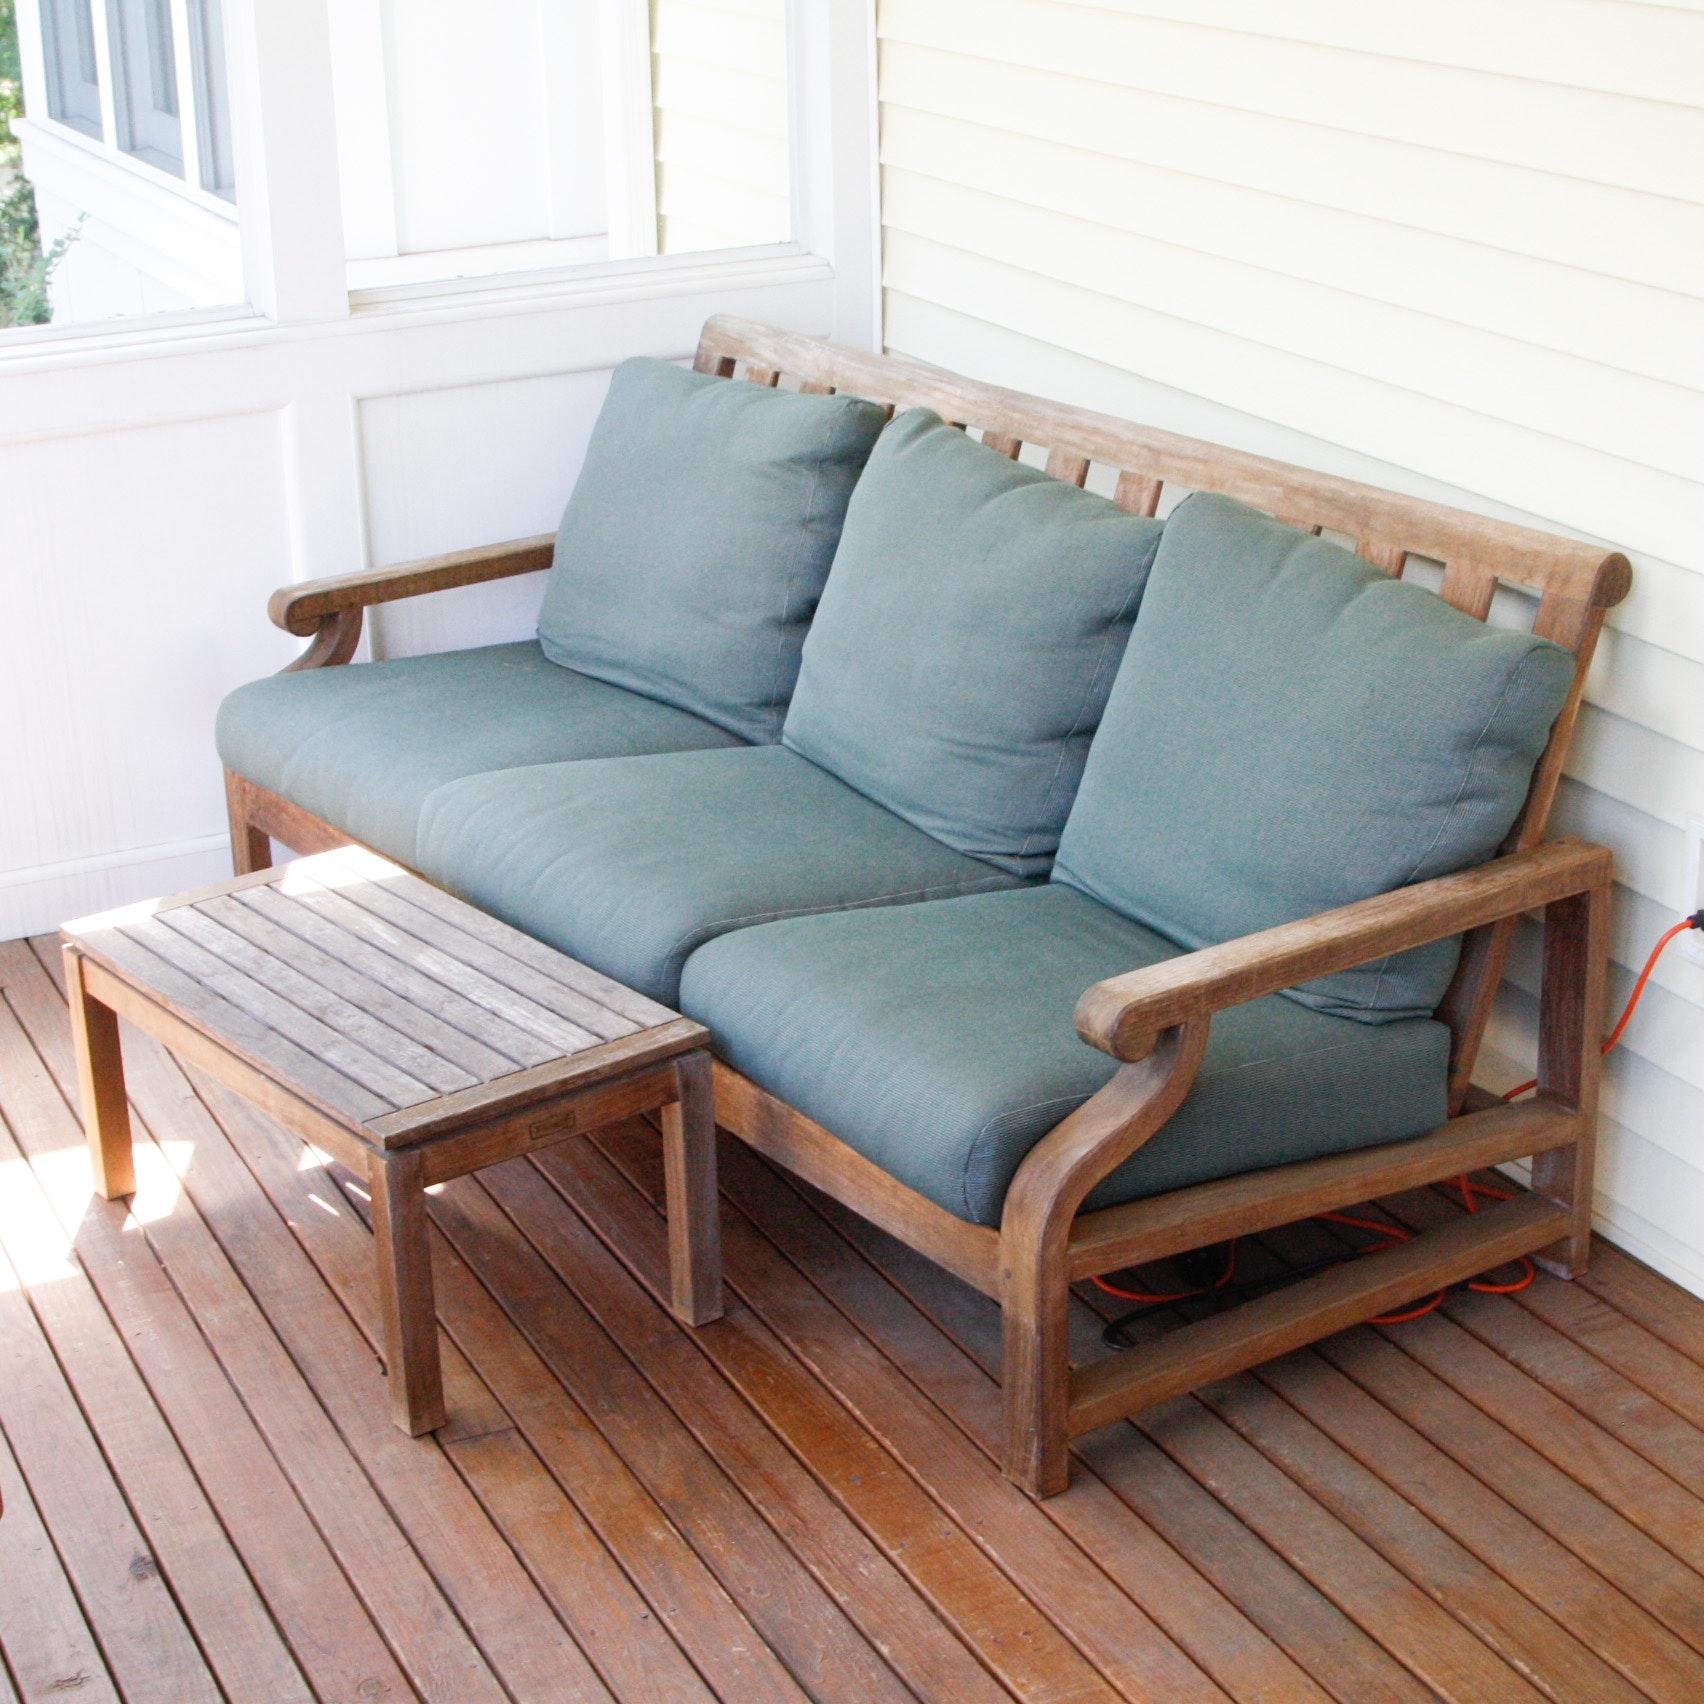 nantucket teak wood sofa with coffee table - Kingsley Bate